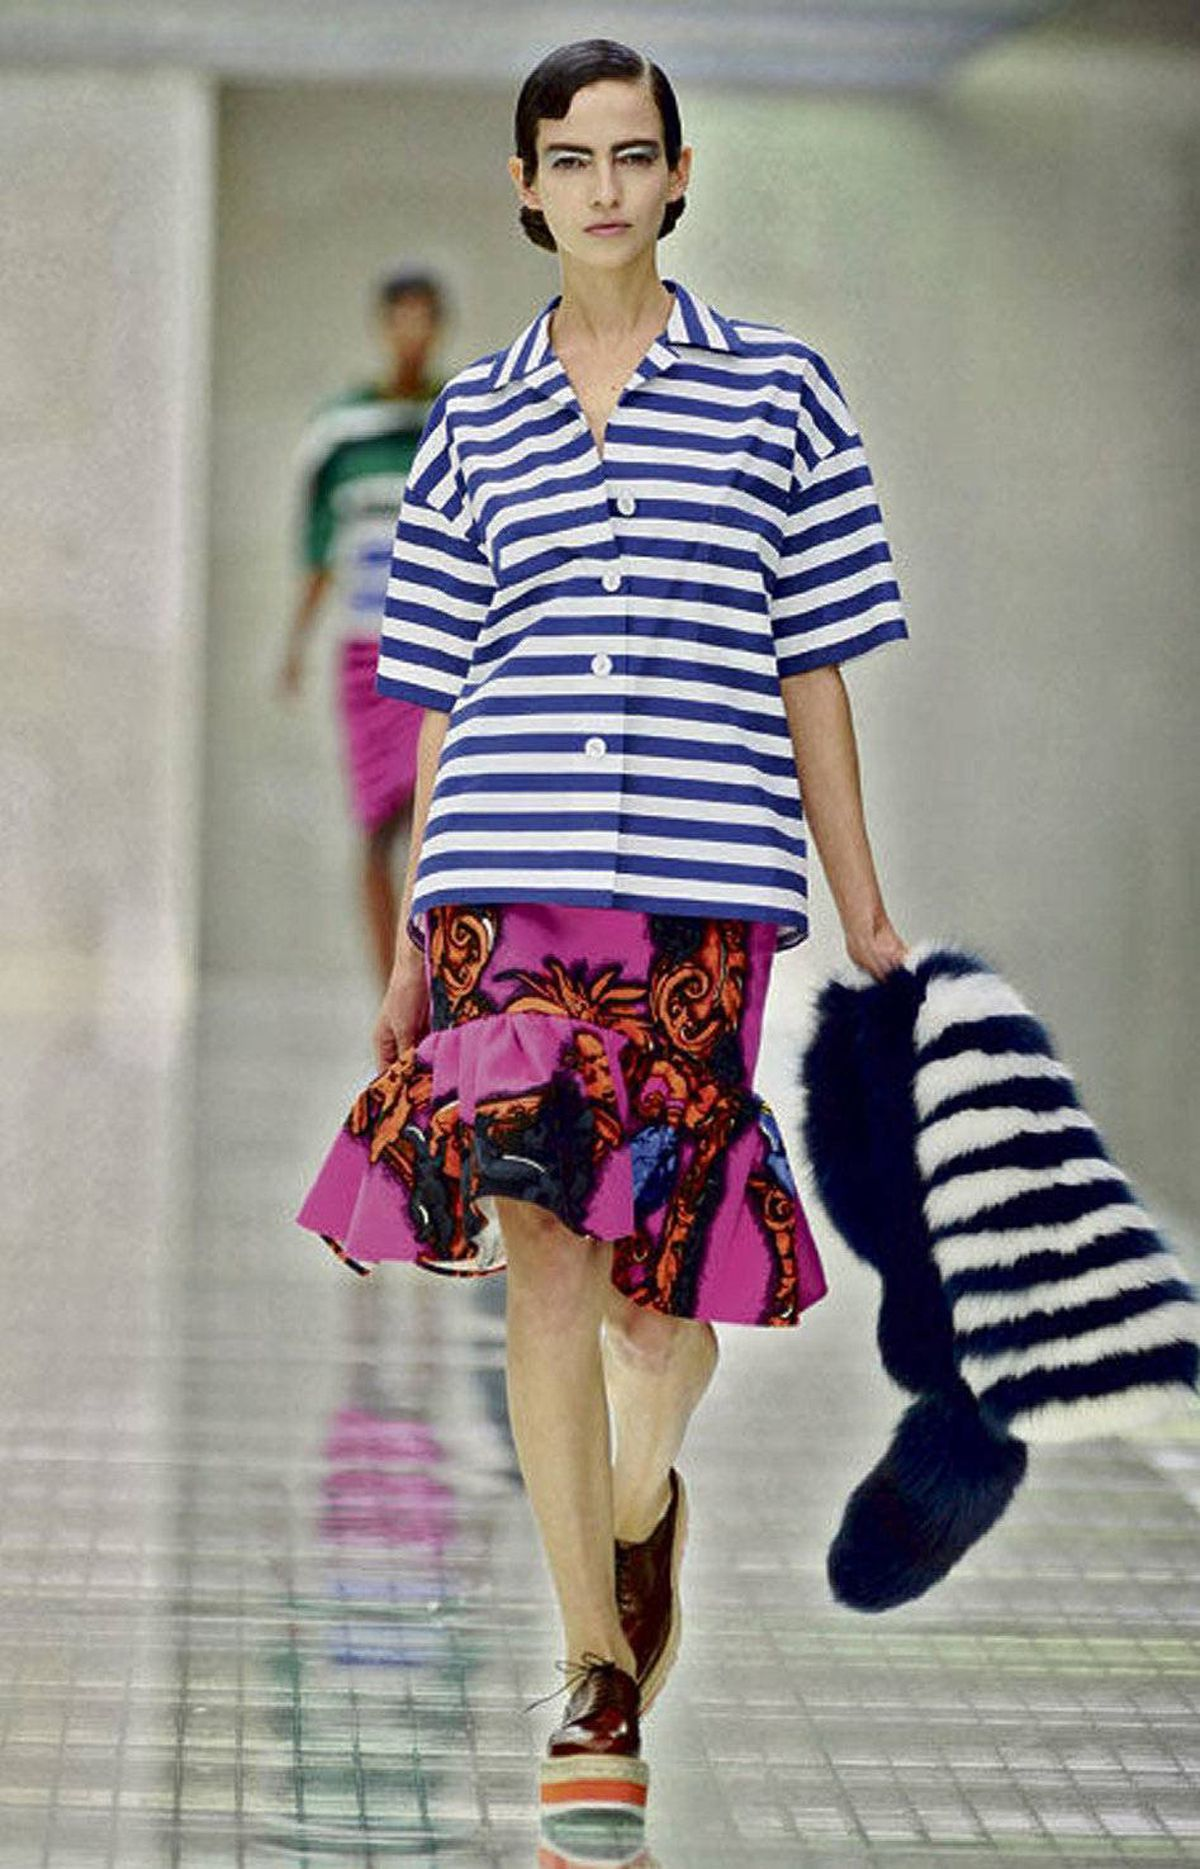 Prada's take on bold prints